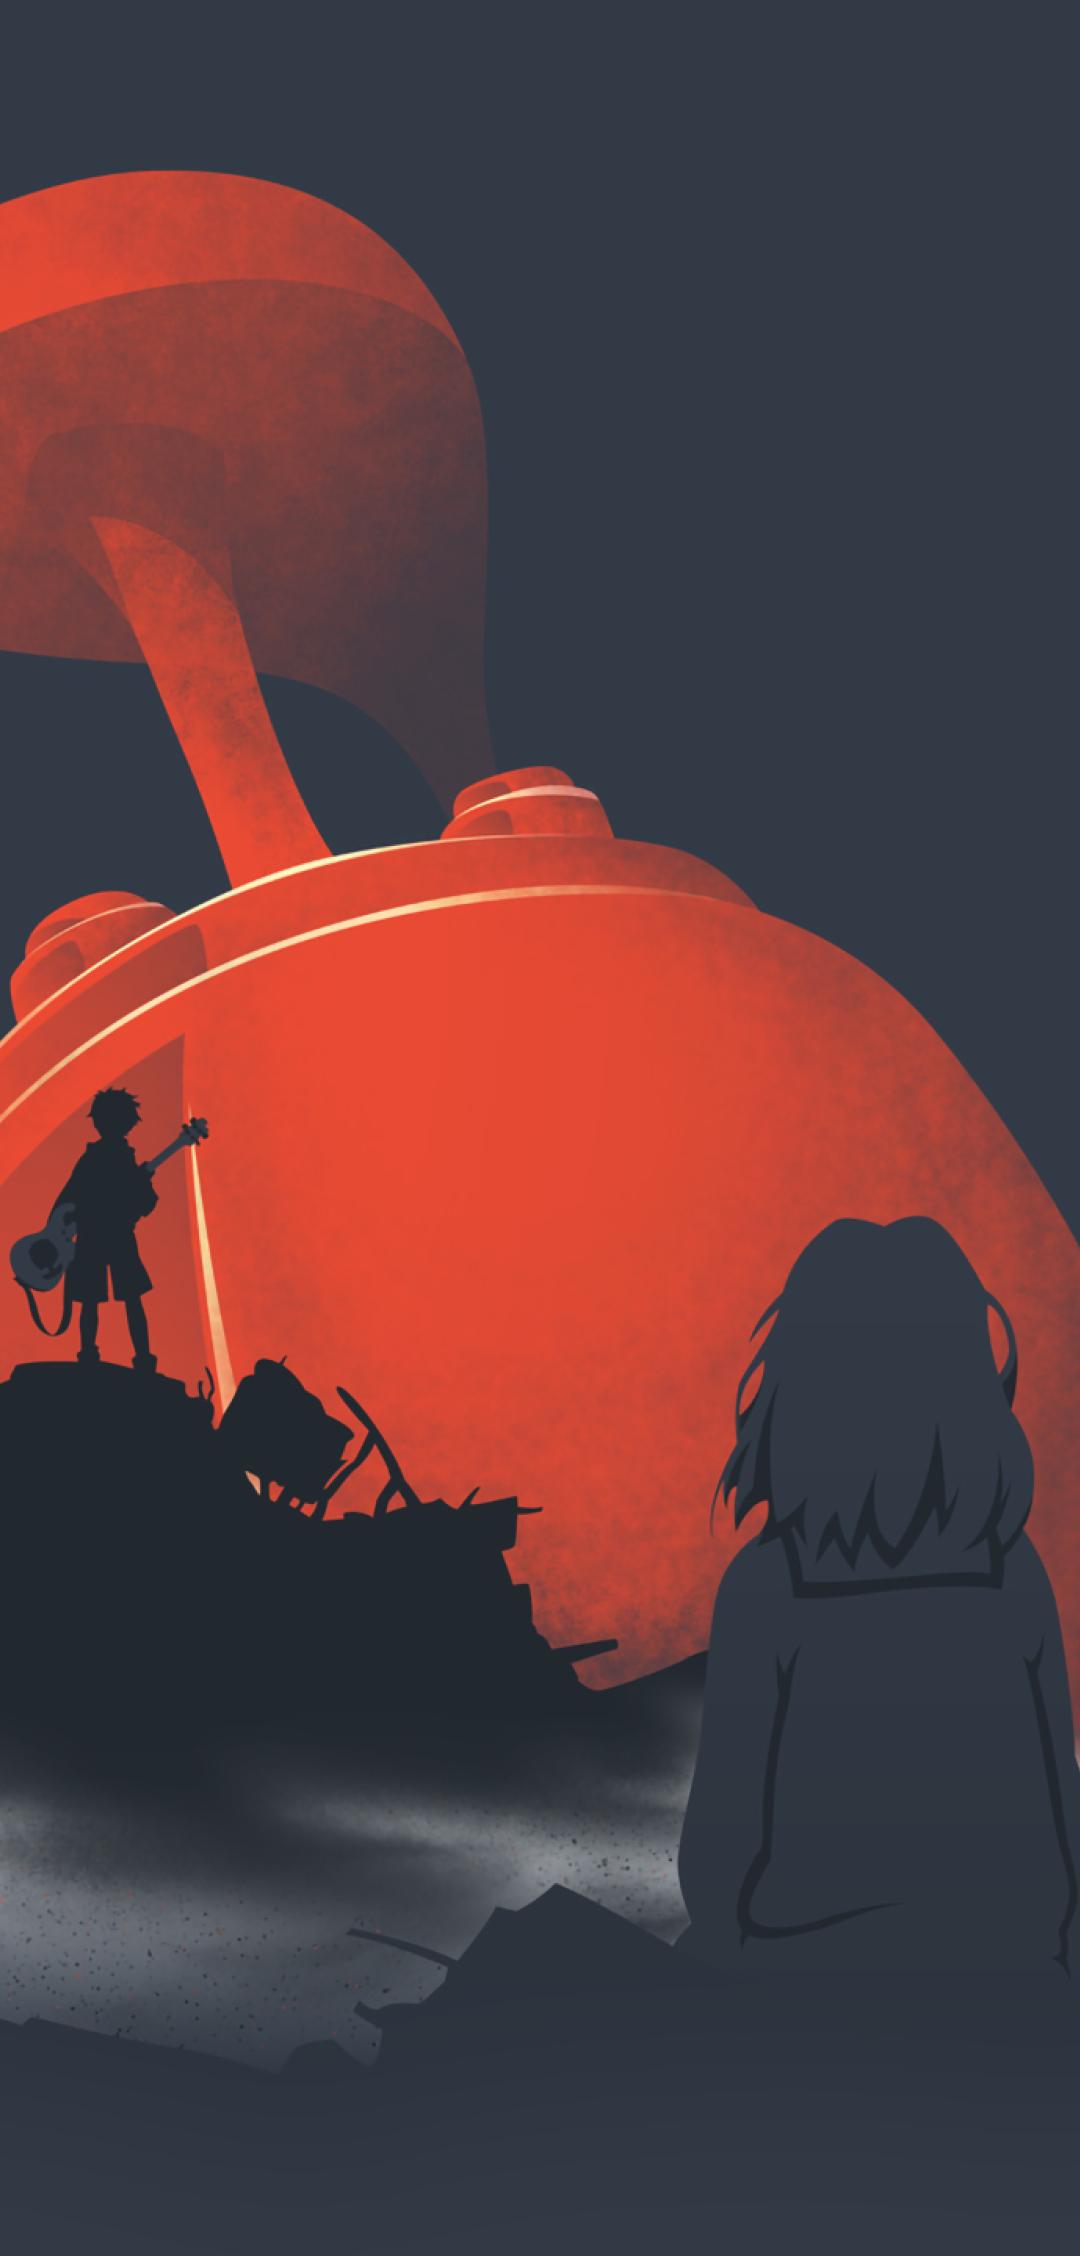 Download 1152x864 wallpaper silhouette, furi kuri, anime, artwork.